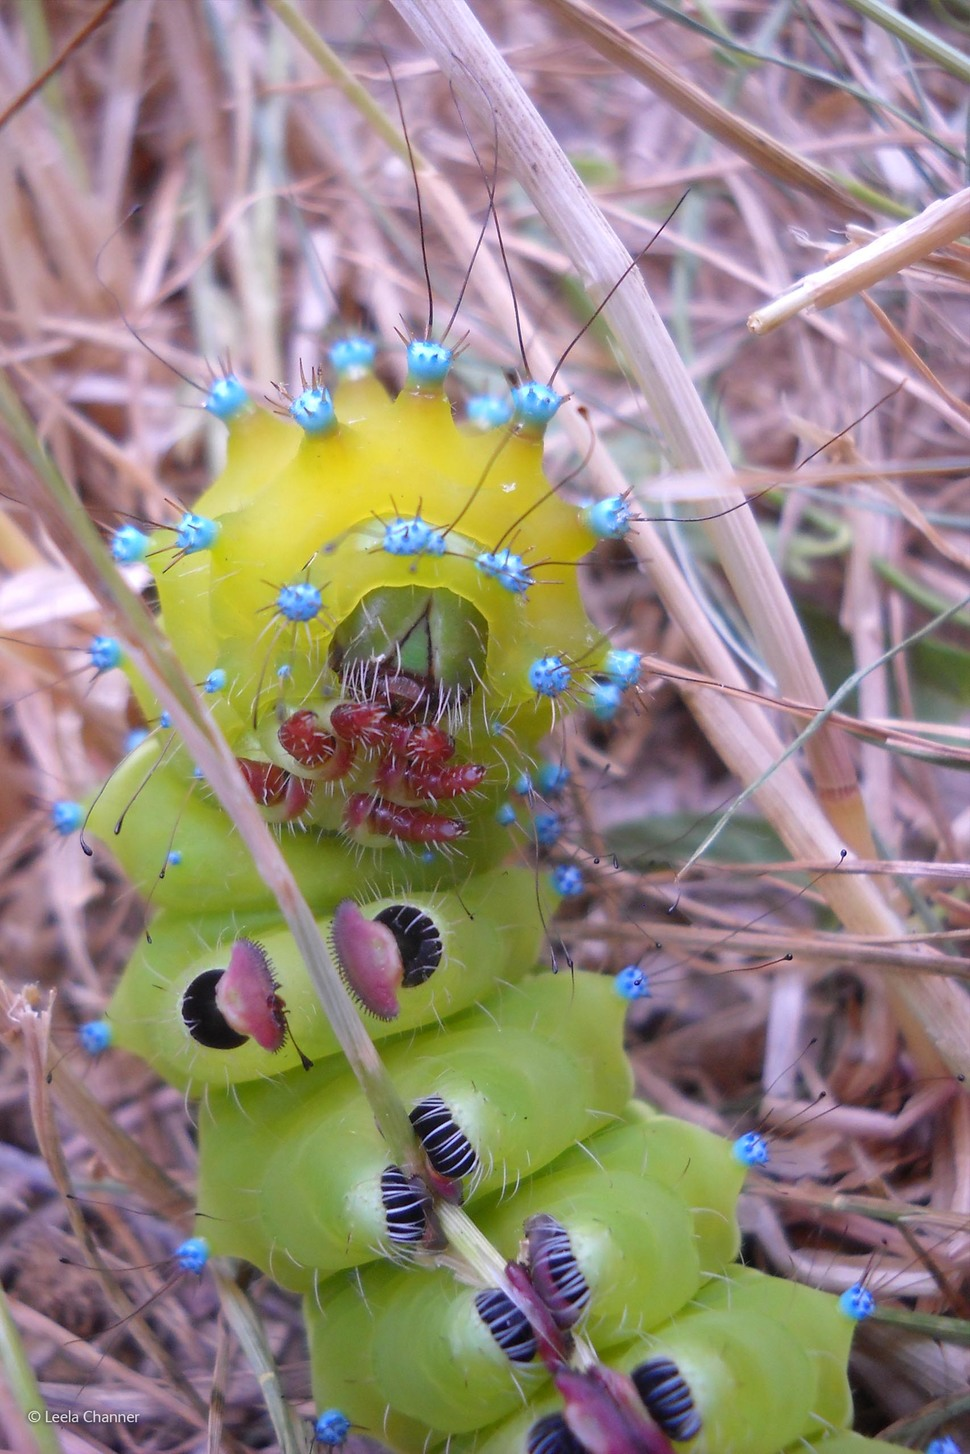 'Great Peacock Moth Caterpillar' by Leela Channer